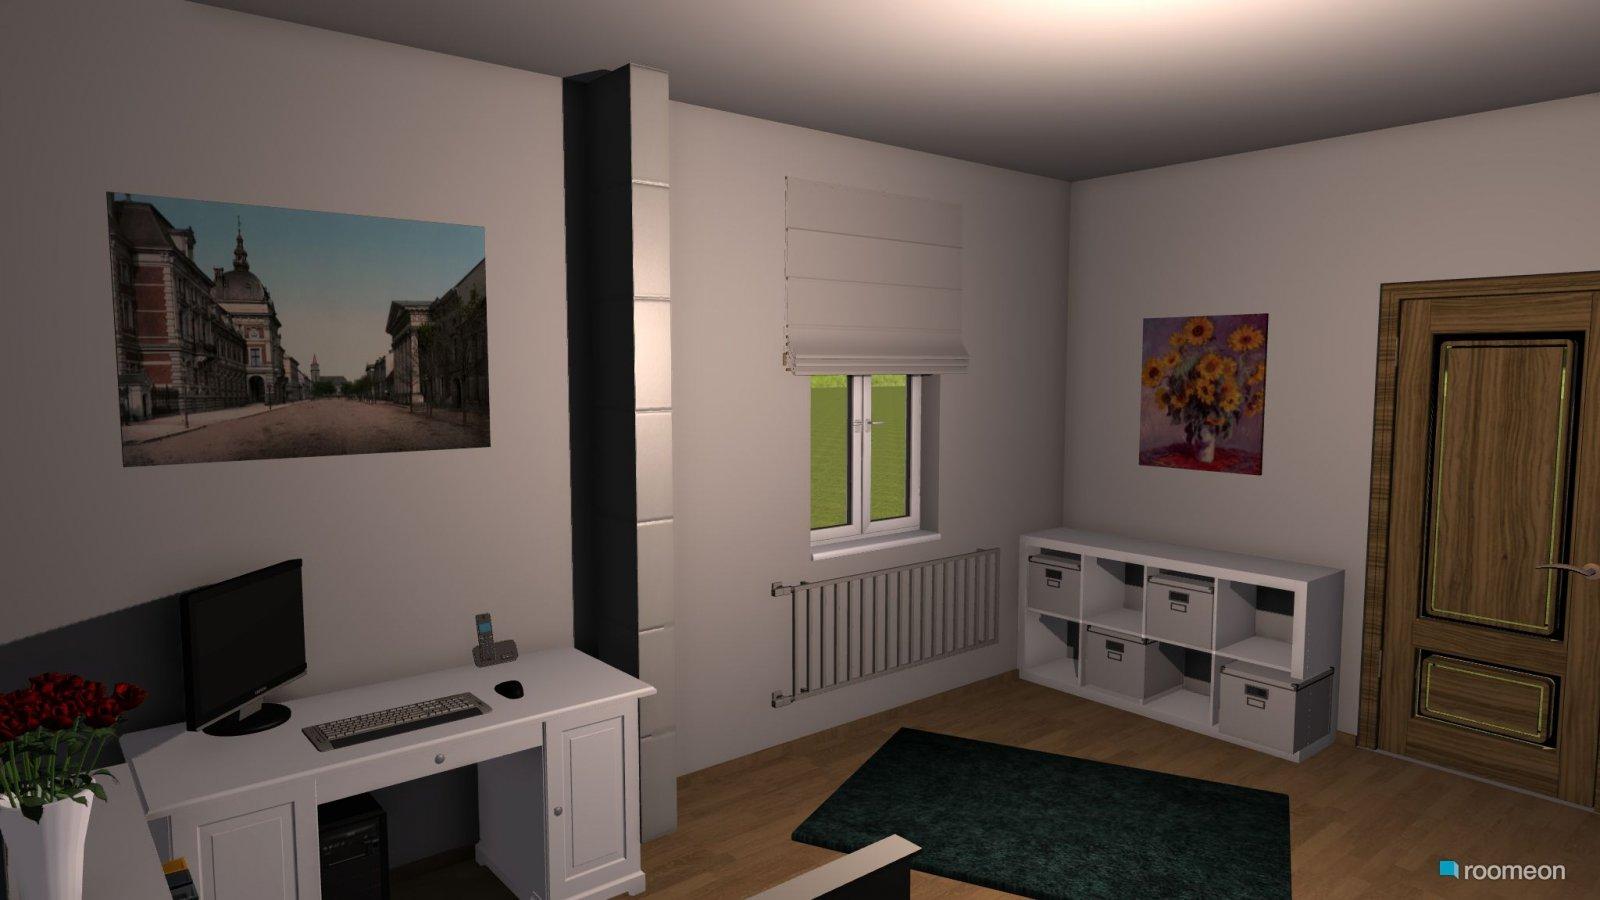 Raumplanung kleines schlafzimmer roomeon community for Raumgestaltung jobs